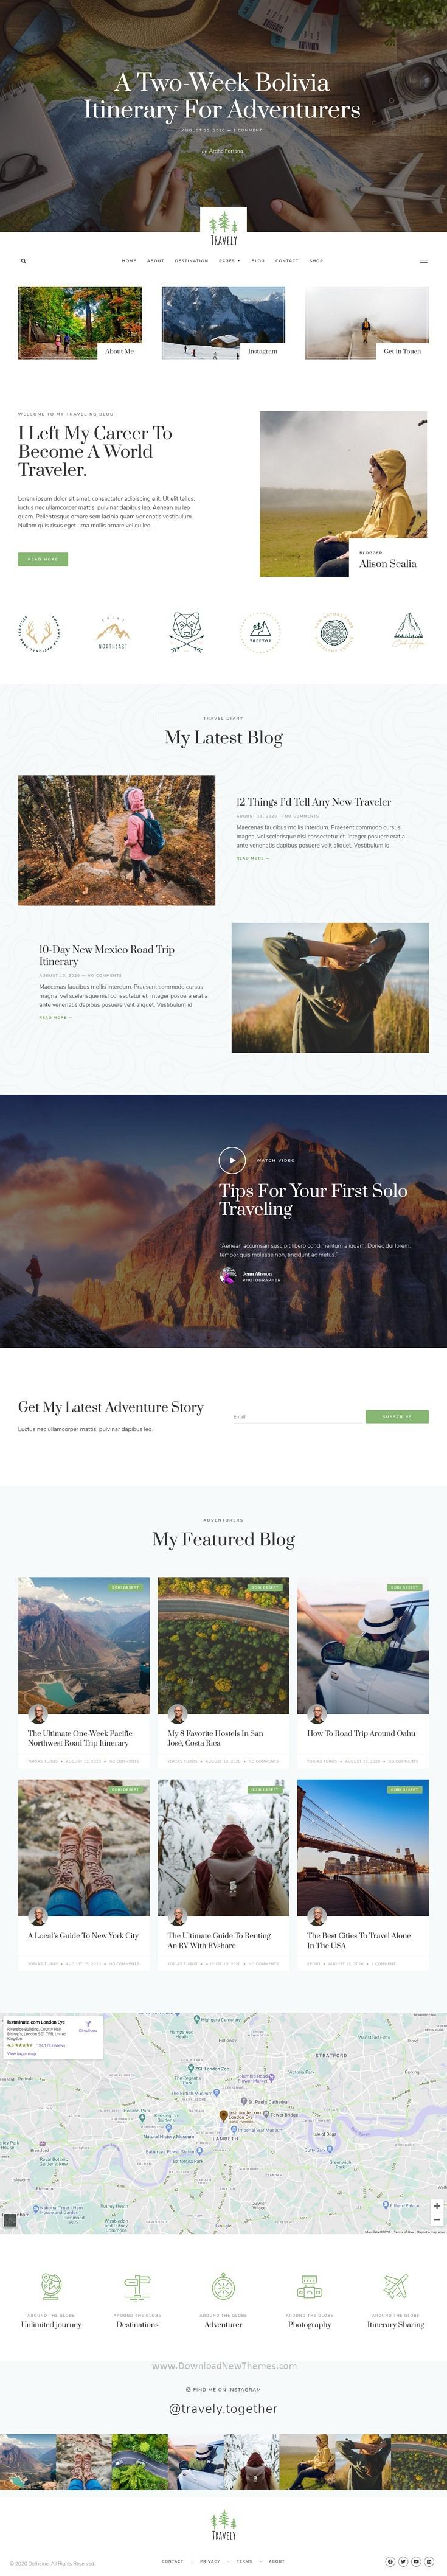 Travel Blog Template Kit